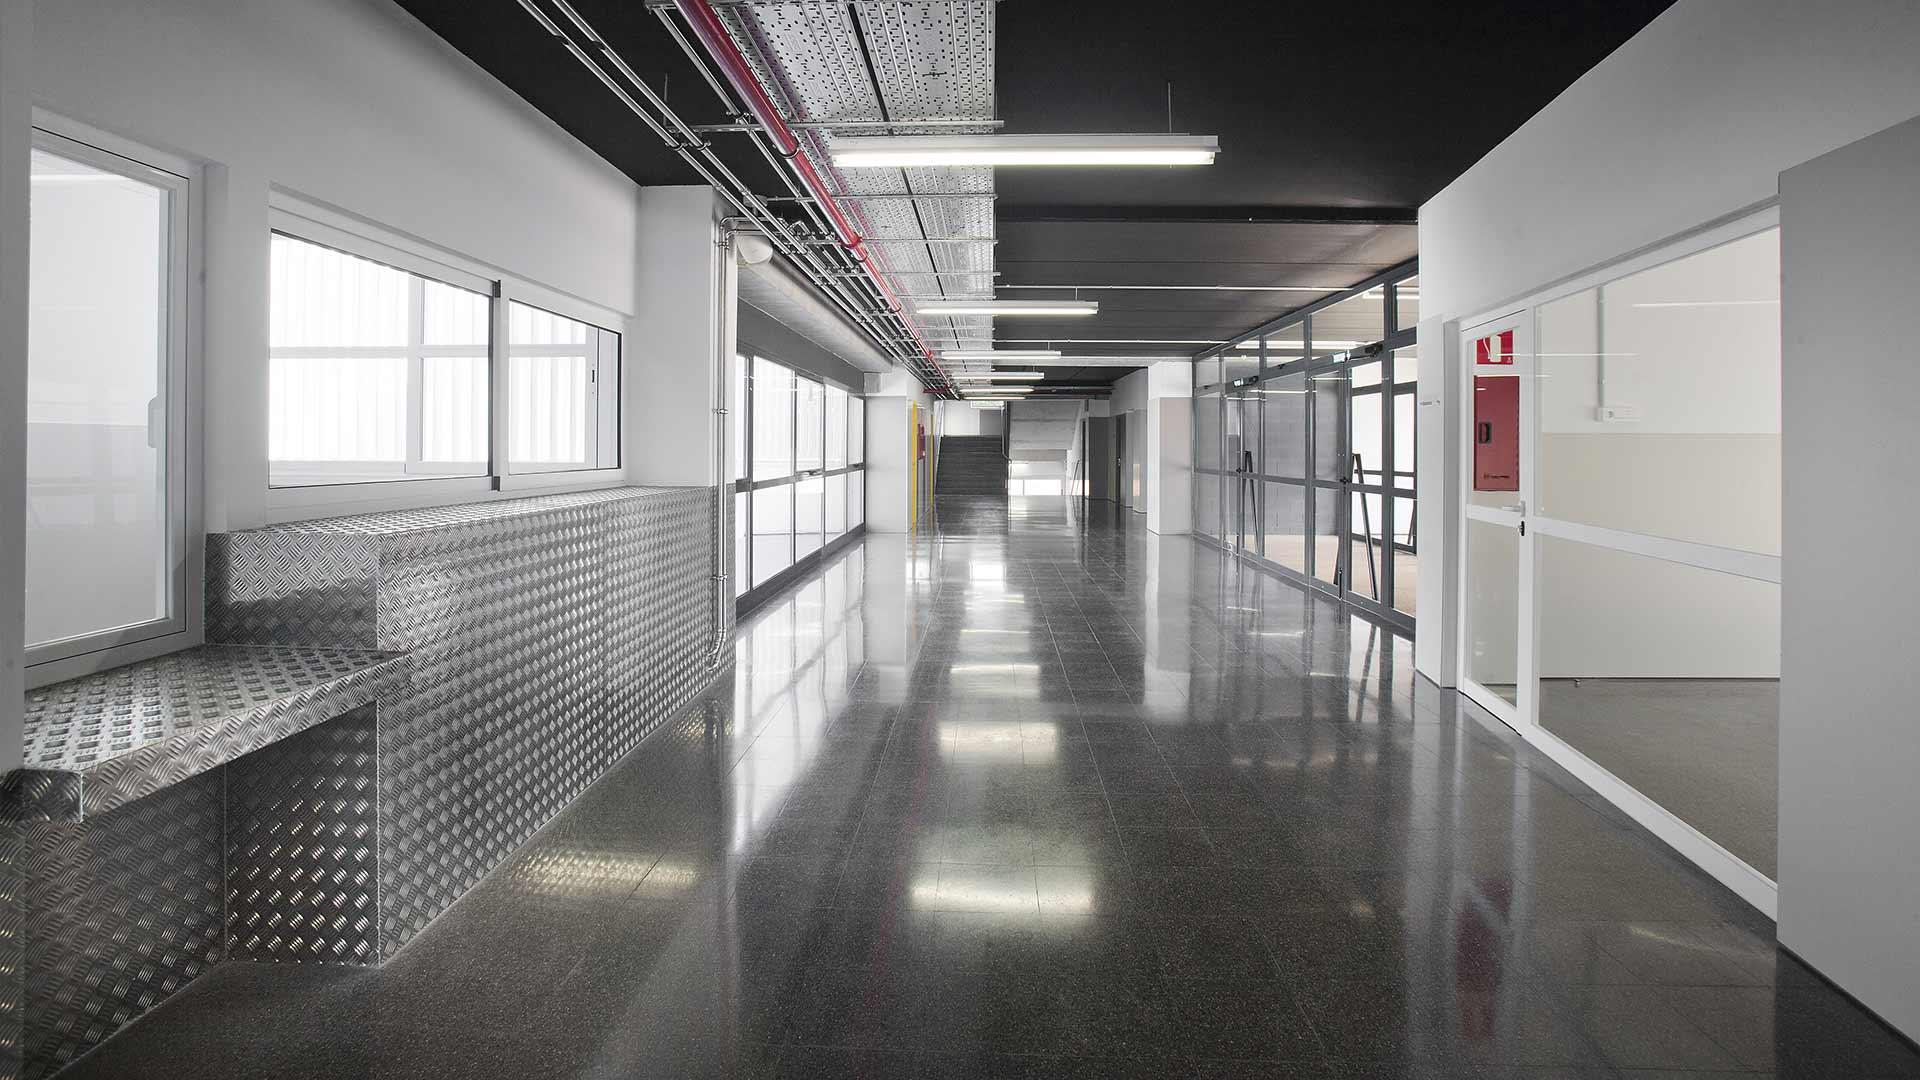 prefabricats-pujol-terratzo-paviment-escoles-montornes-2